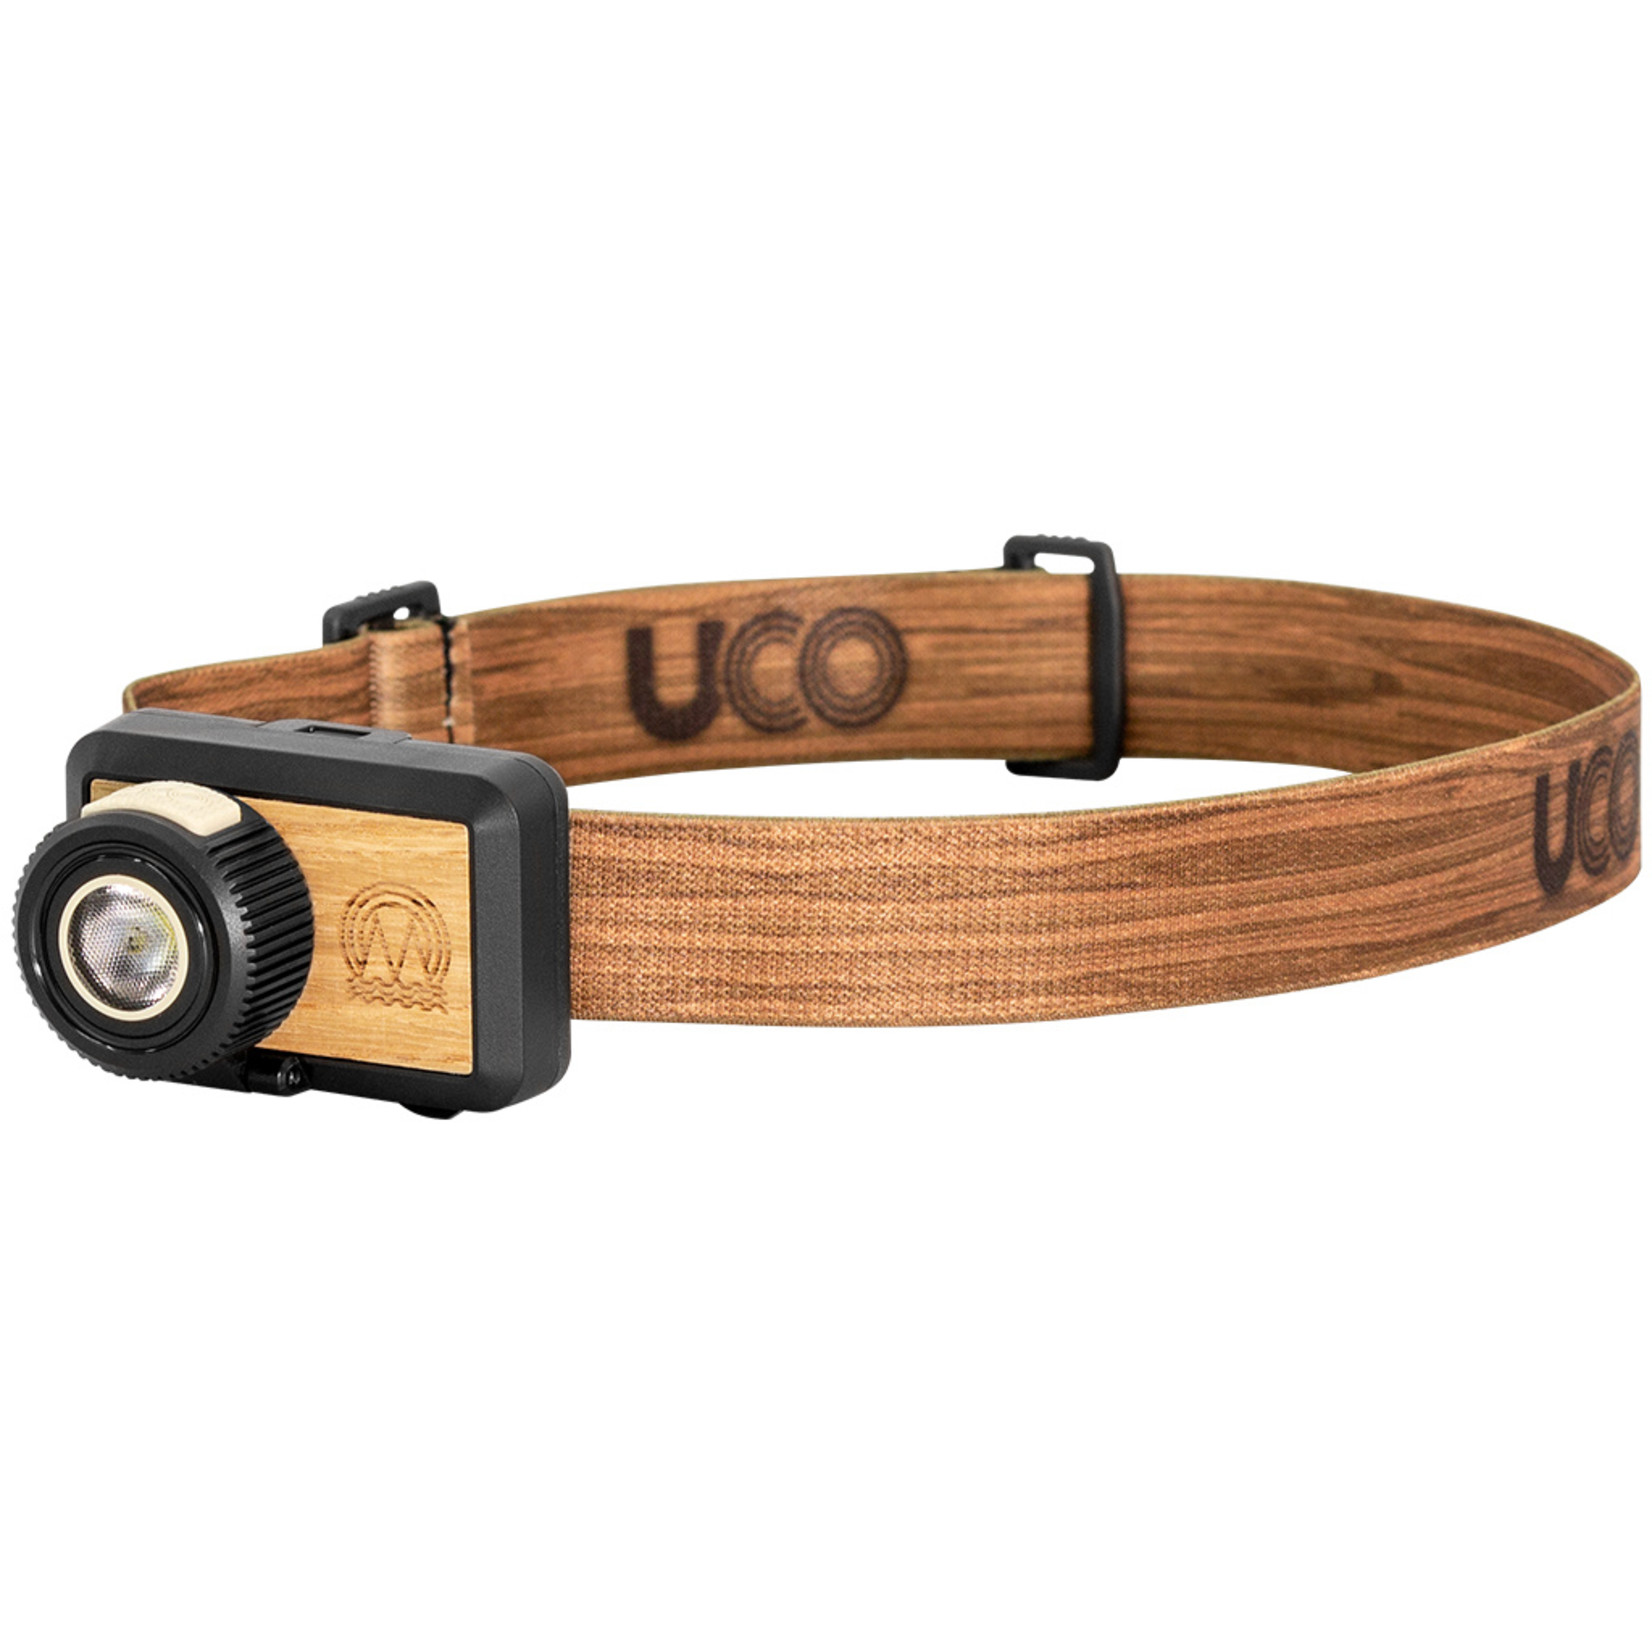 UCO Gear Beta Headlamp